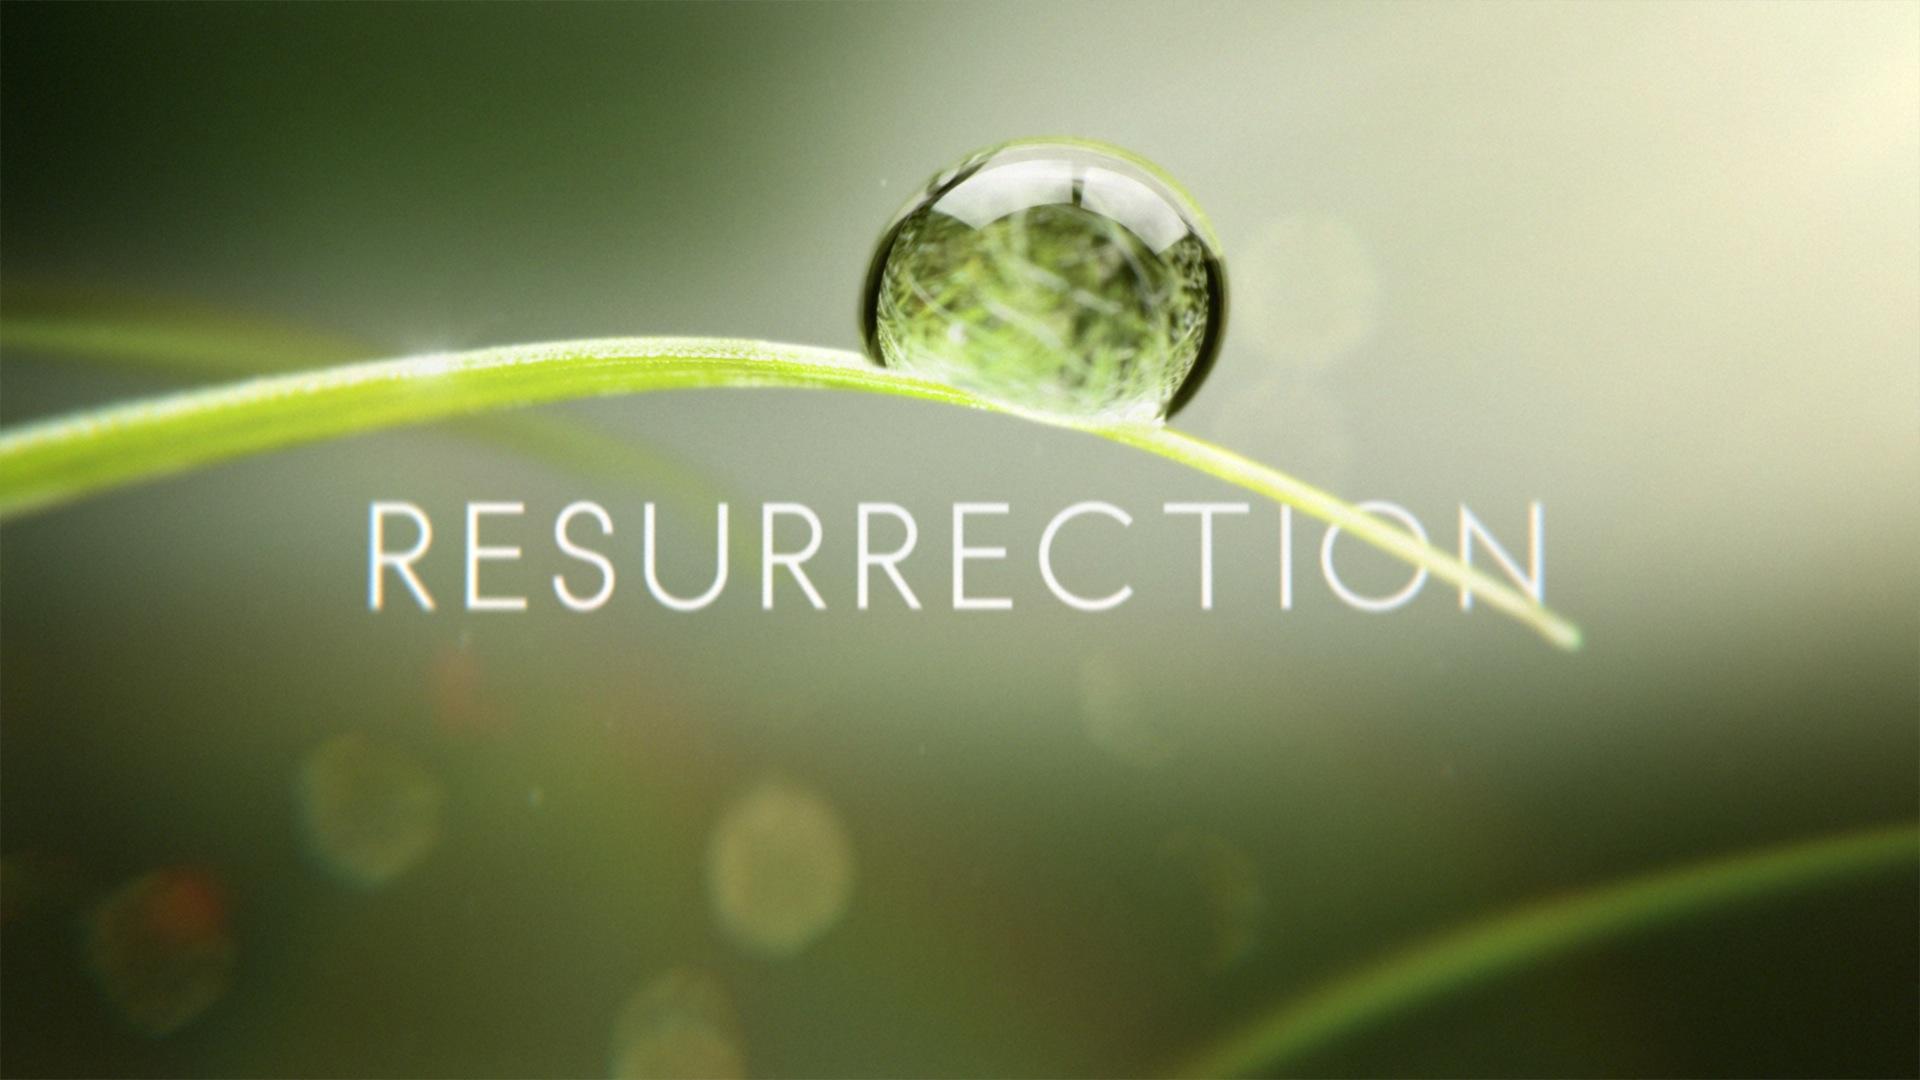 Resurrection (U.S. TV series)